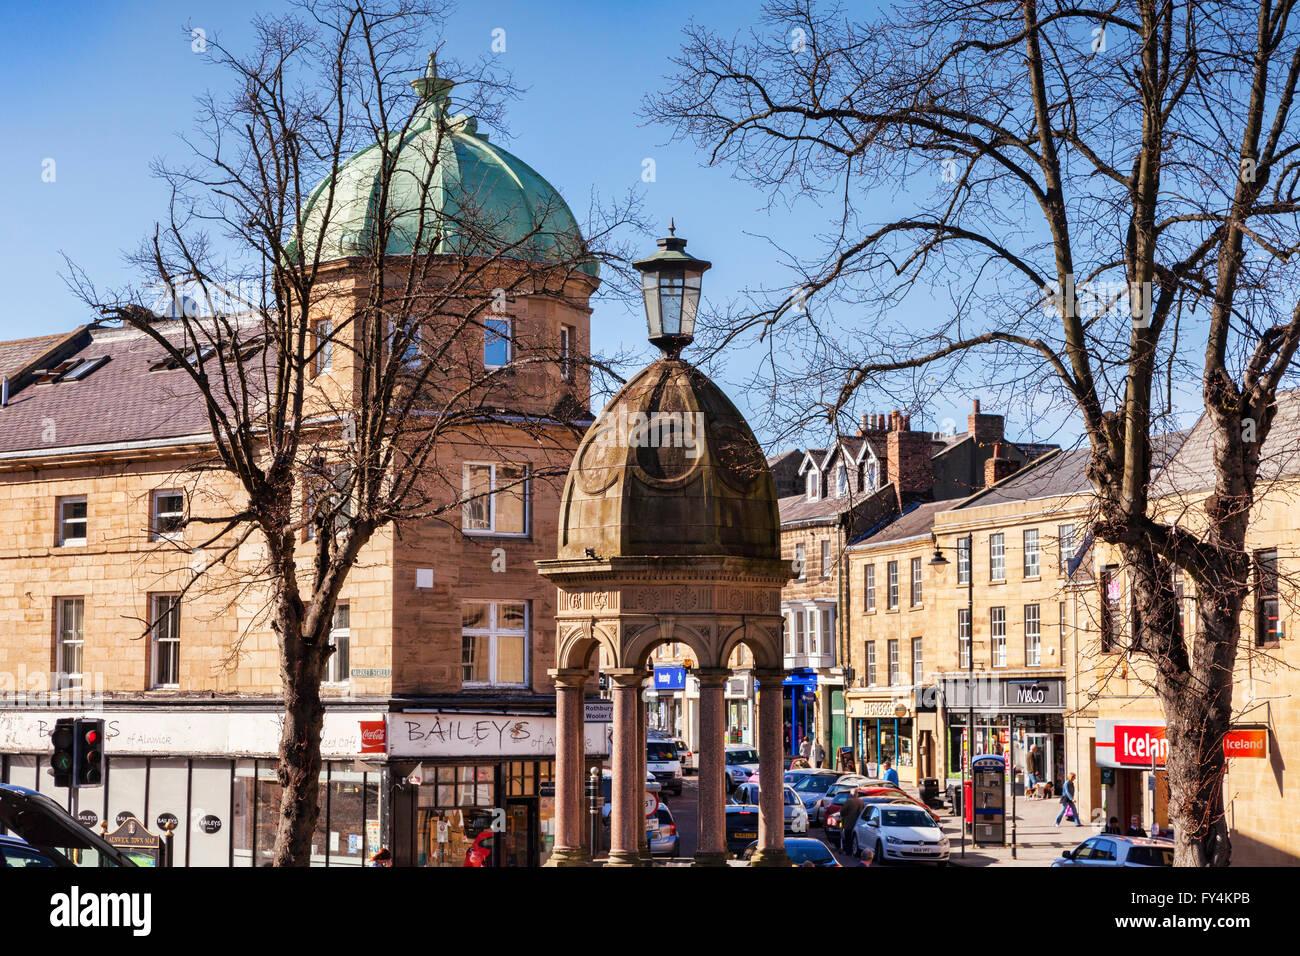 Alnwick Town Centre, Northumberland, England, UK - Stock Image